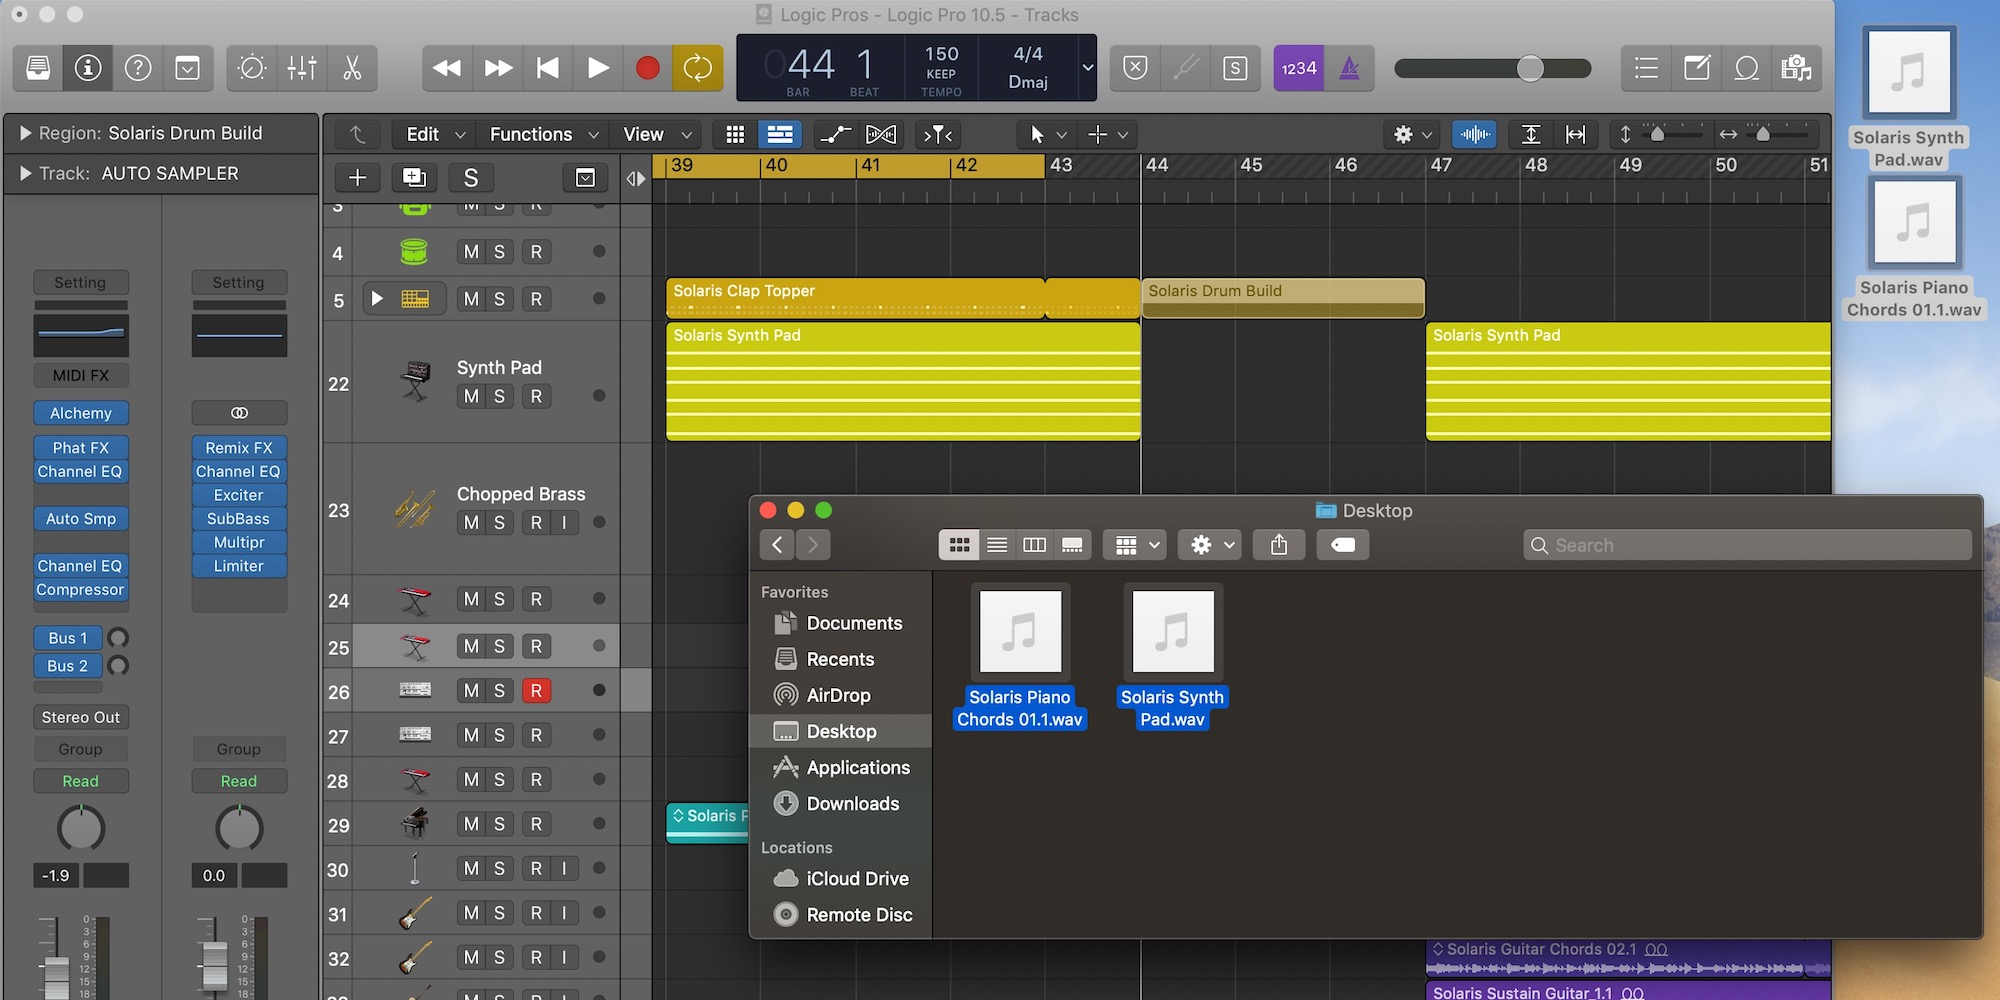 Logic Pro X 10.5: Drag and Drop export — one-click audio/MIDI region sharing - 9to5Mac